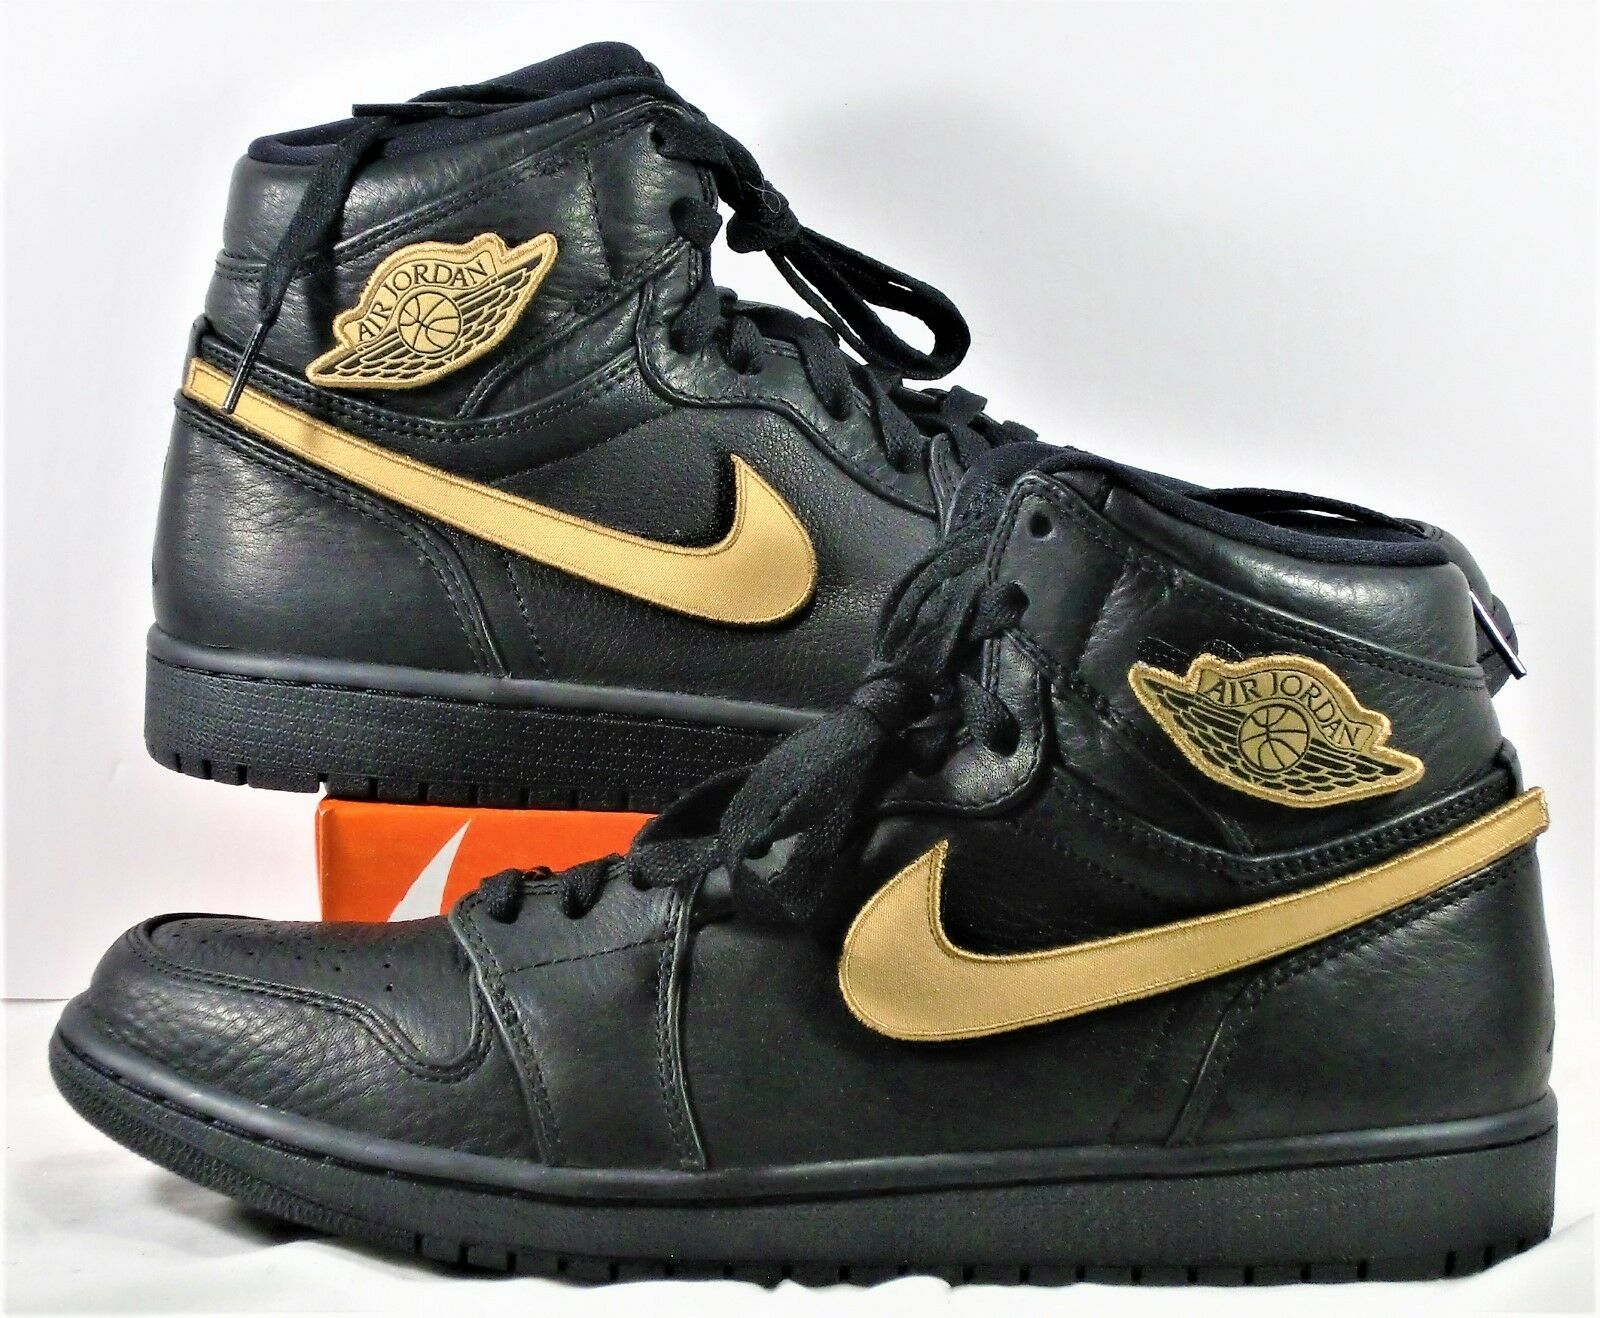 Nike air air air jordan 1 'alto bhm oro nero history month sz 10,5 nuovi 908656 001 4858e6